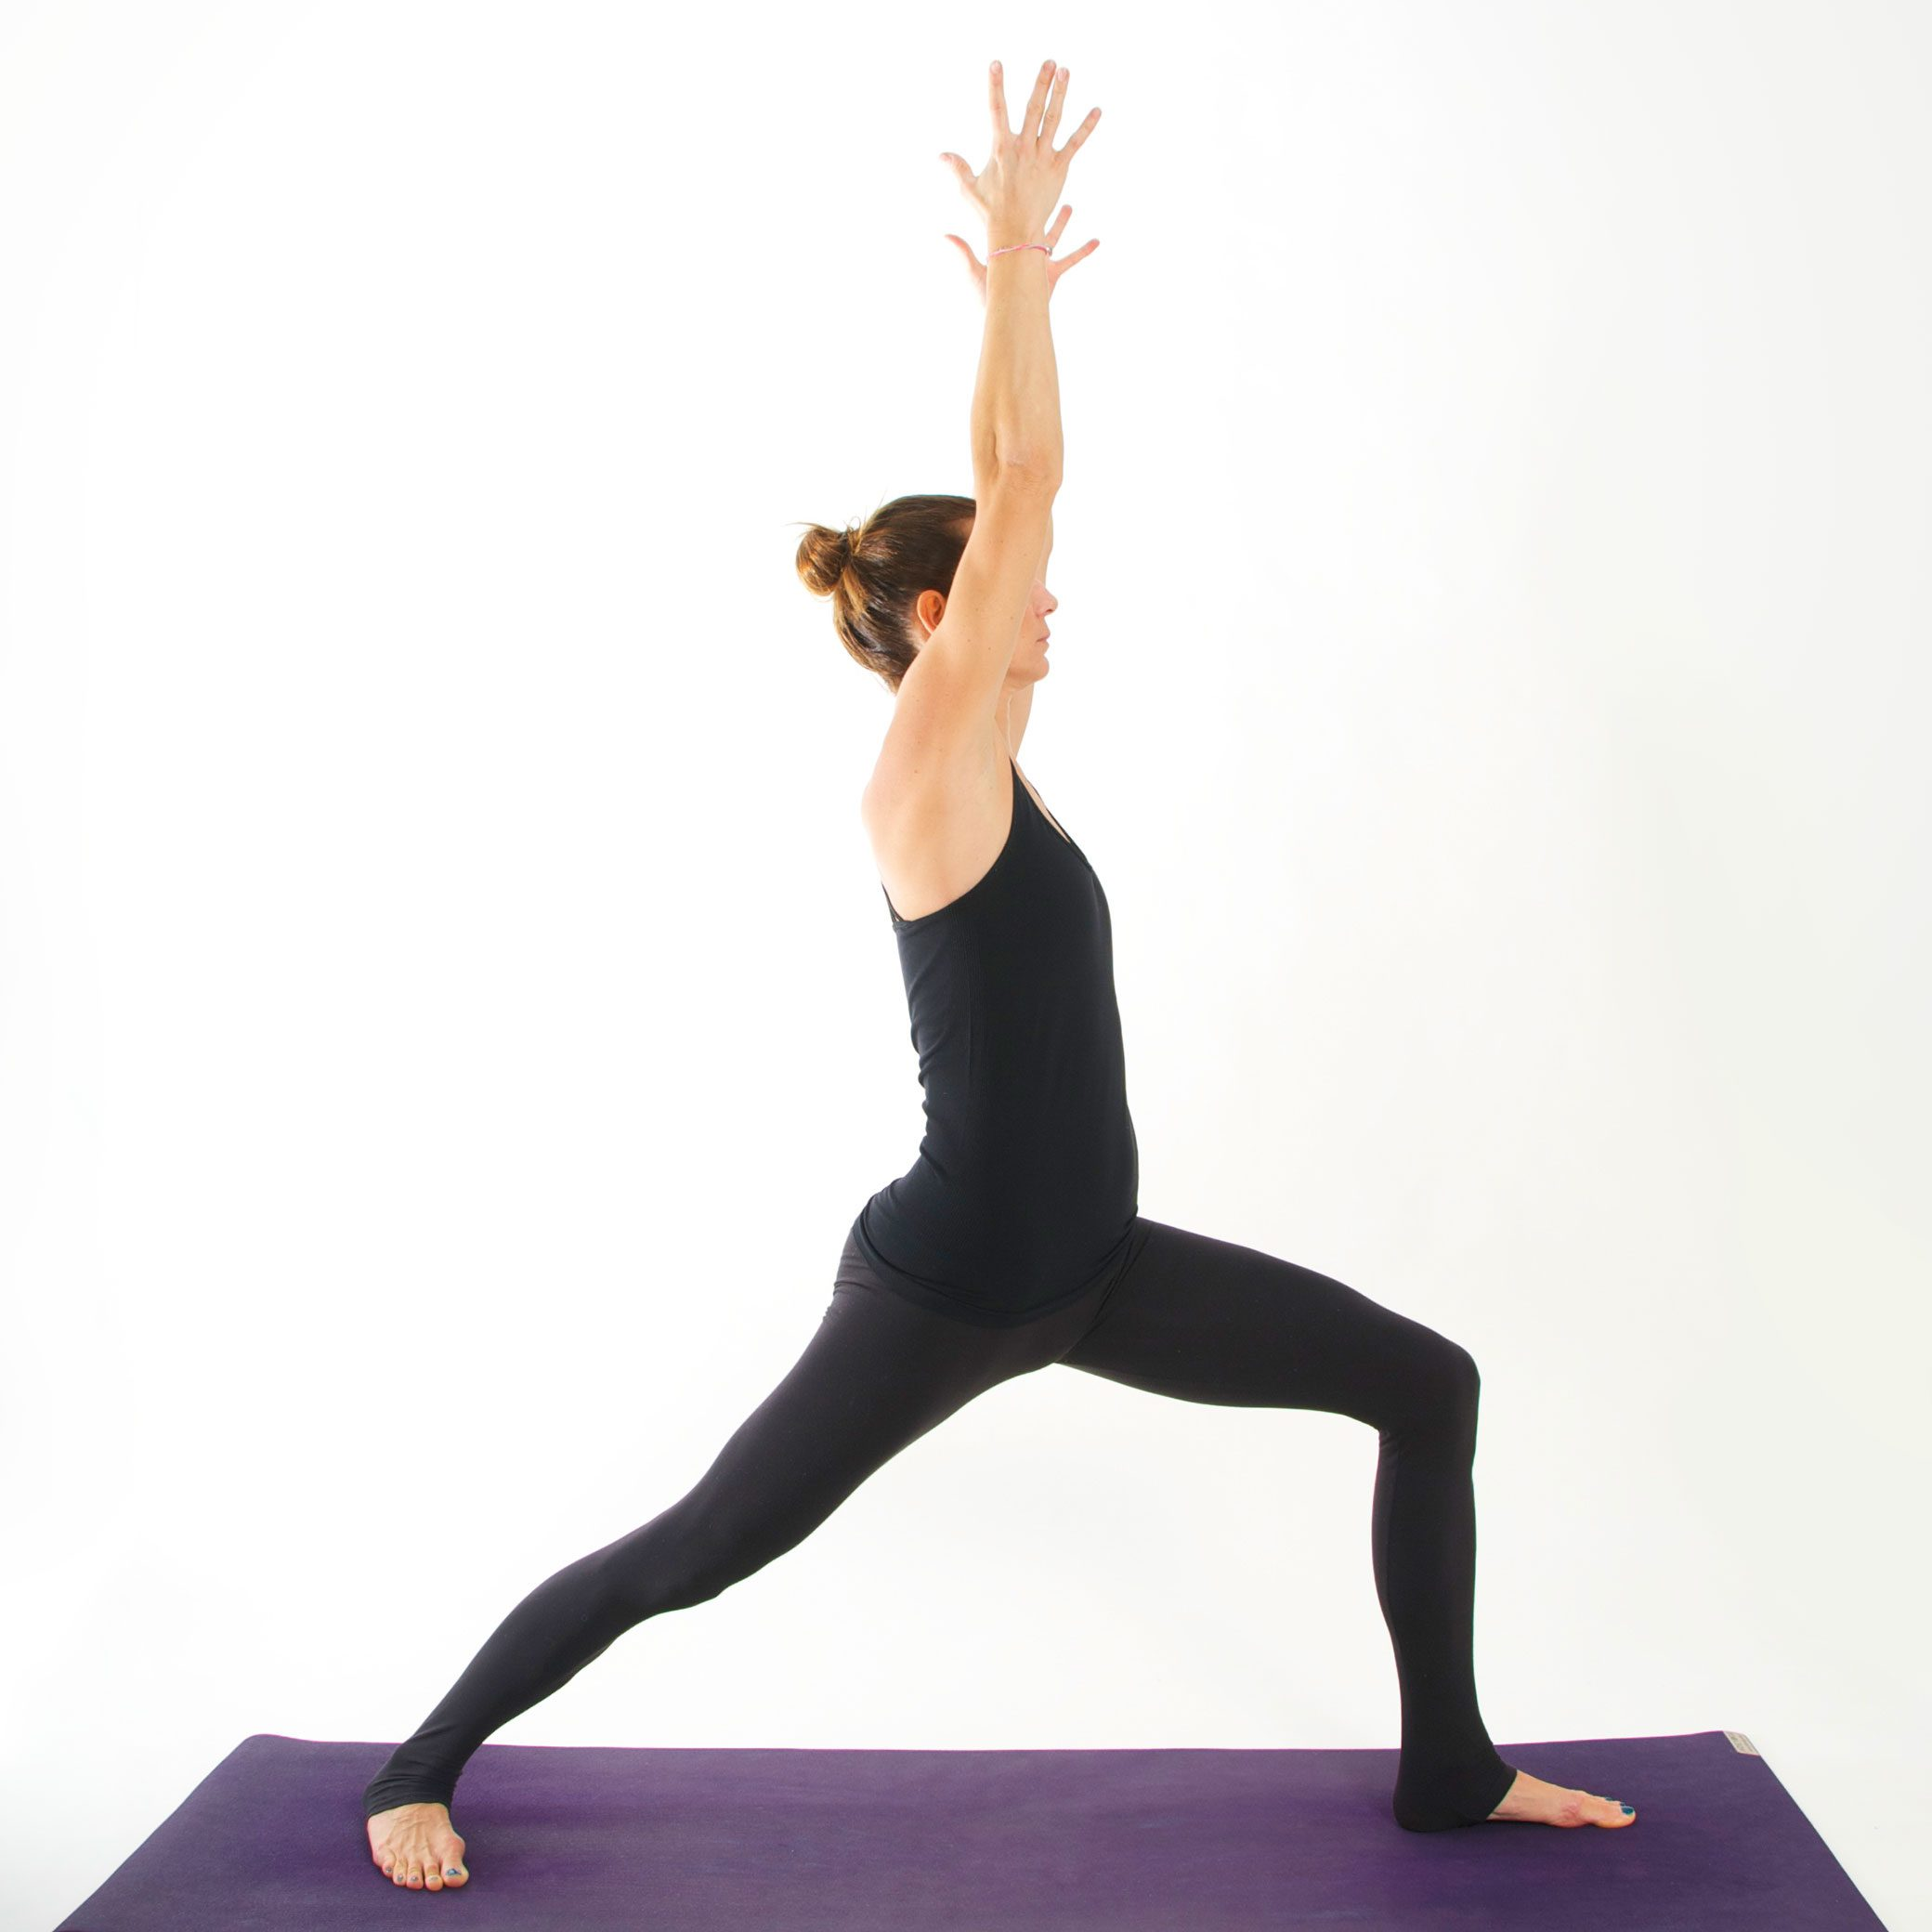 Yoga Asana I KRIEGER I I myyogaflows